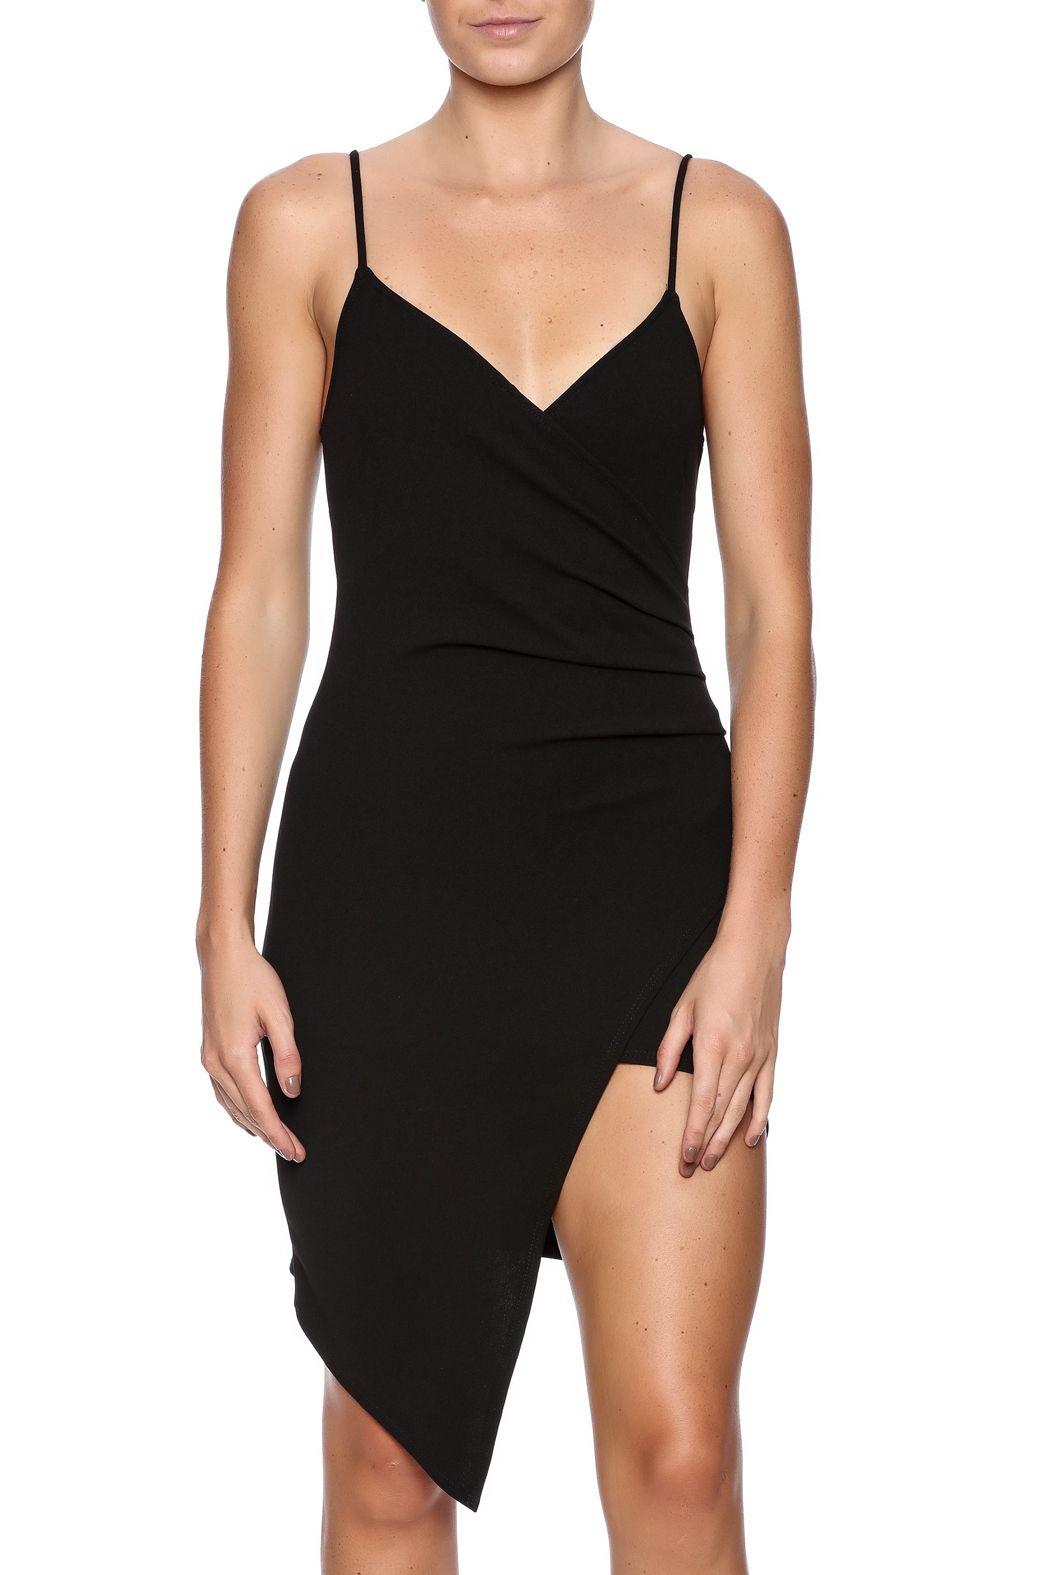 Black spaghetti strap dress with a v-neckline, wrap front design and back zipper closure.   Bodycon Black Dress by BLANC. Clothing - Dresses - LBD New York City